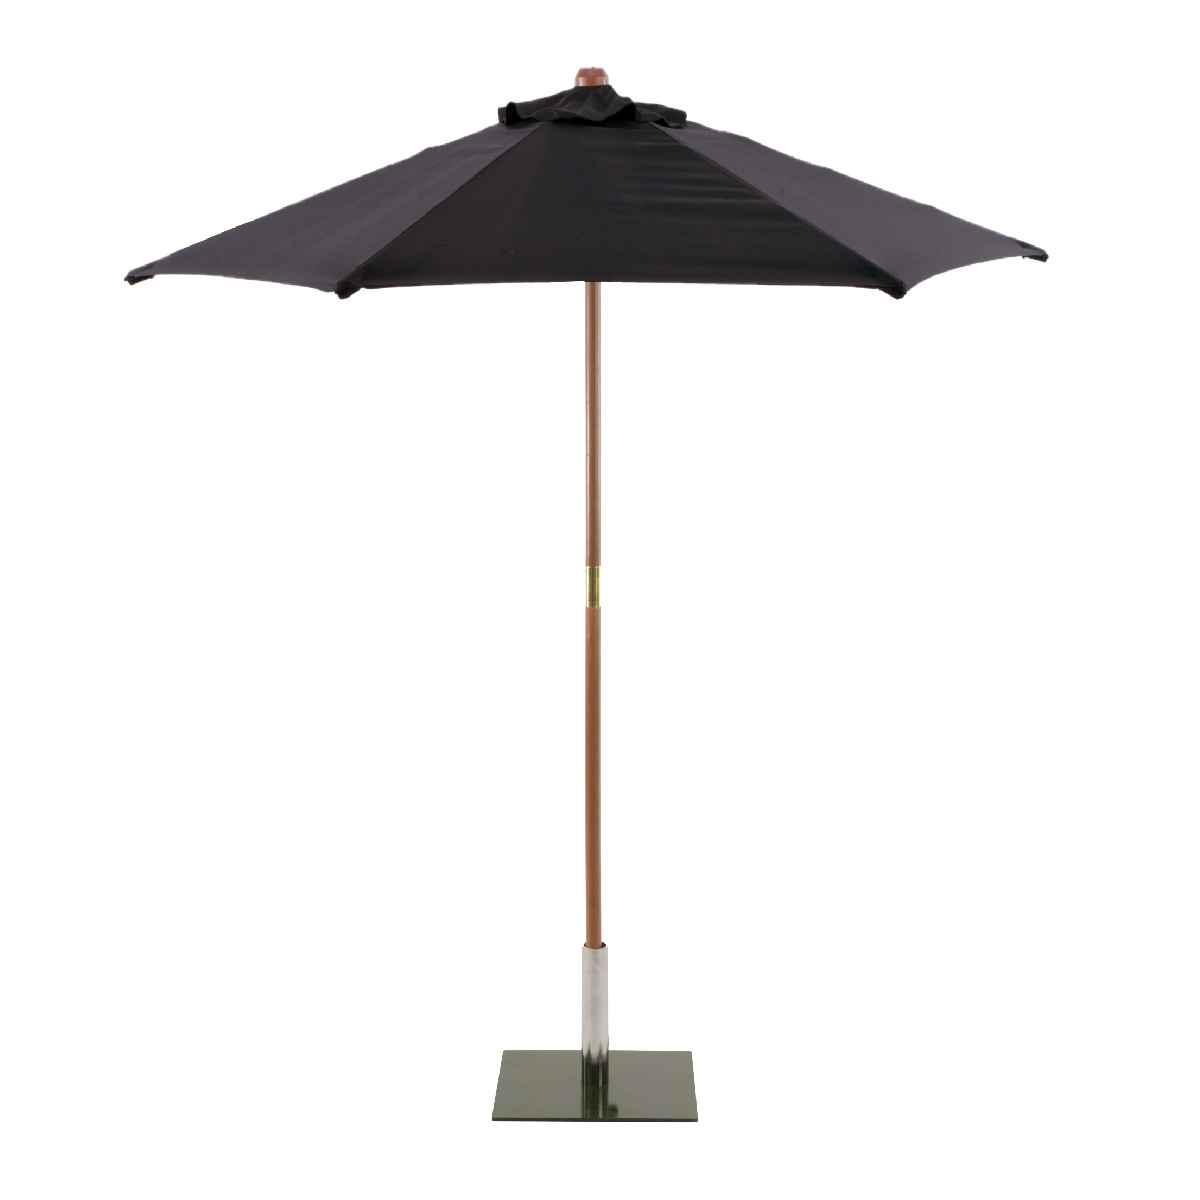 Sturdi Round 3m Wood Parasol (base not included) - Black